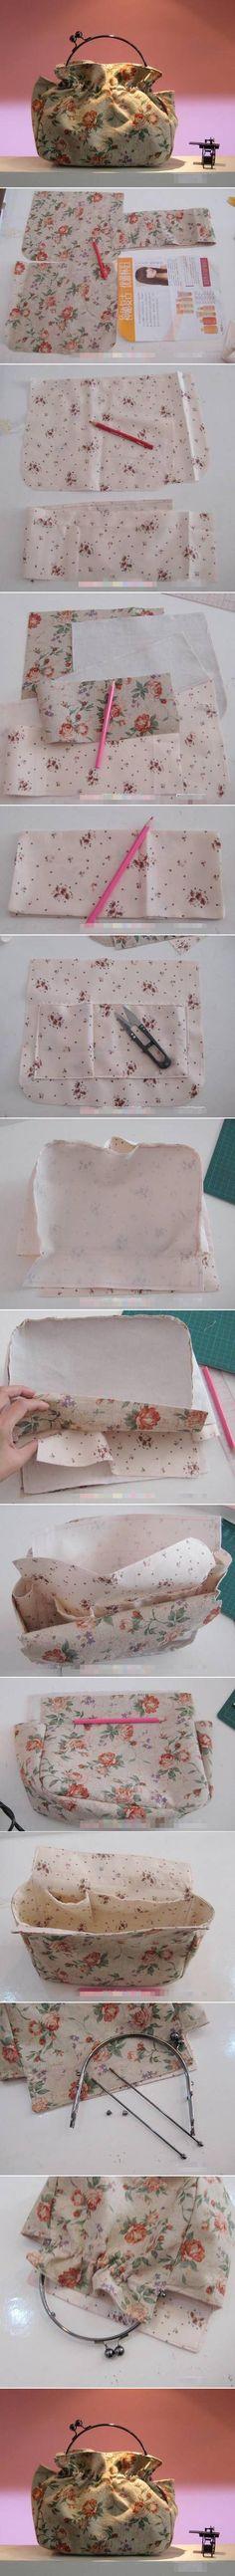 +1*****DIY Semplice Borsa Handmade